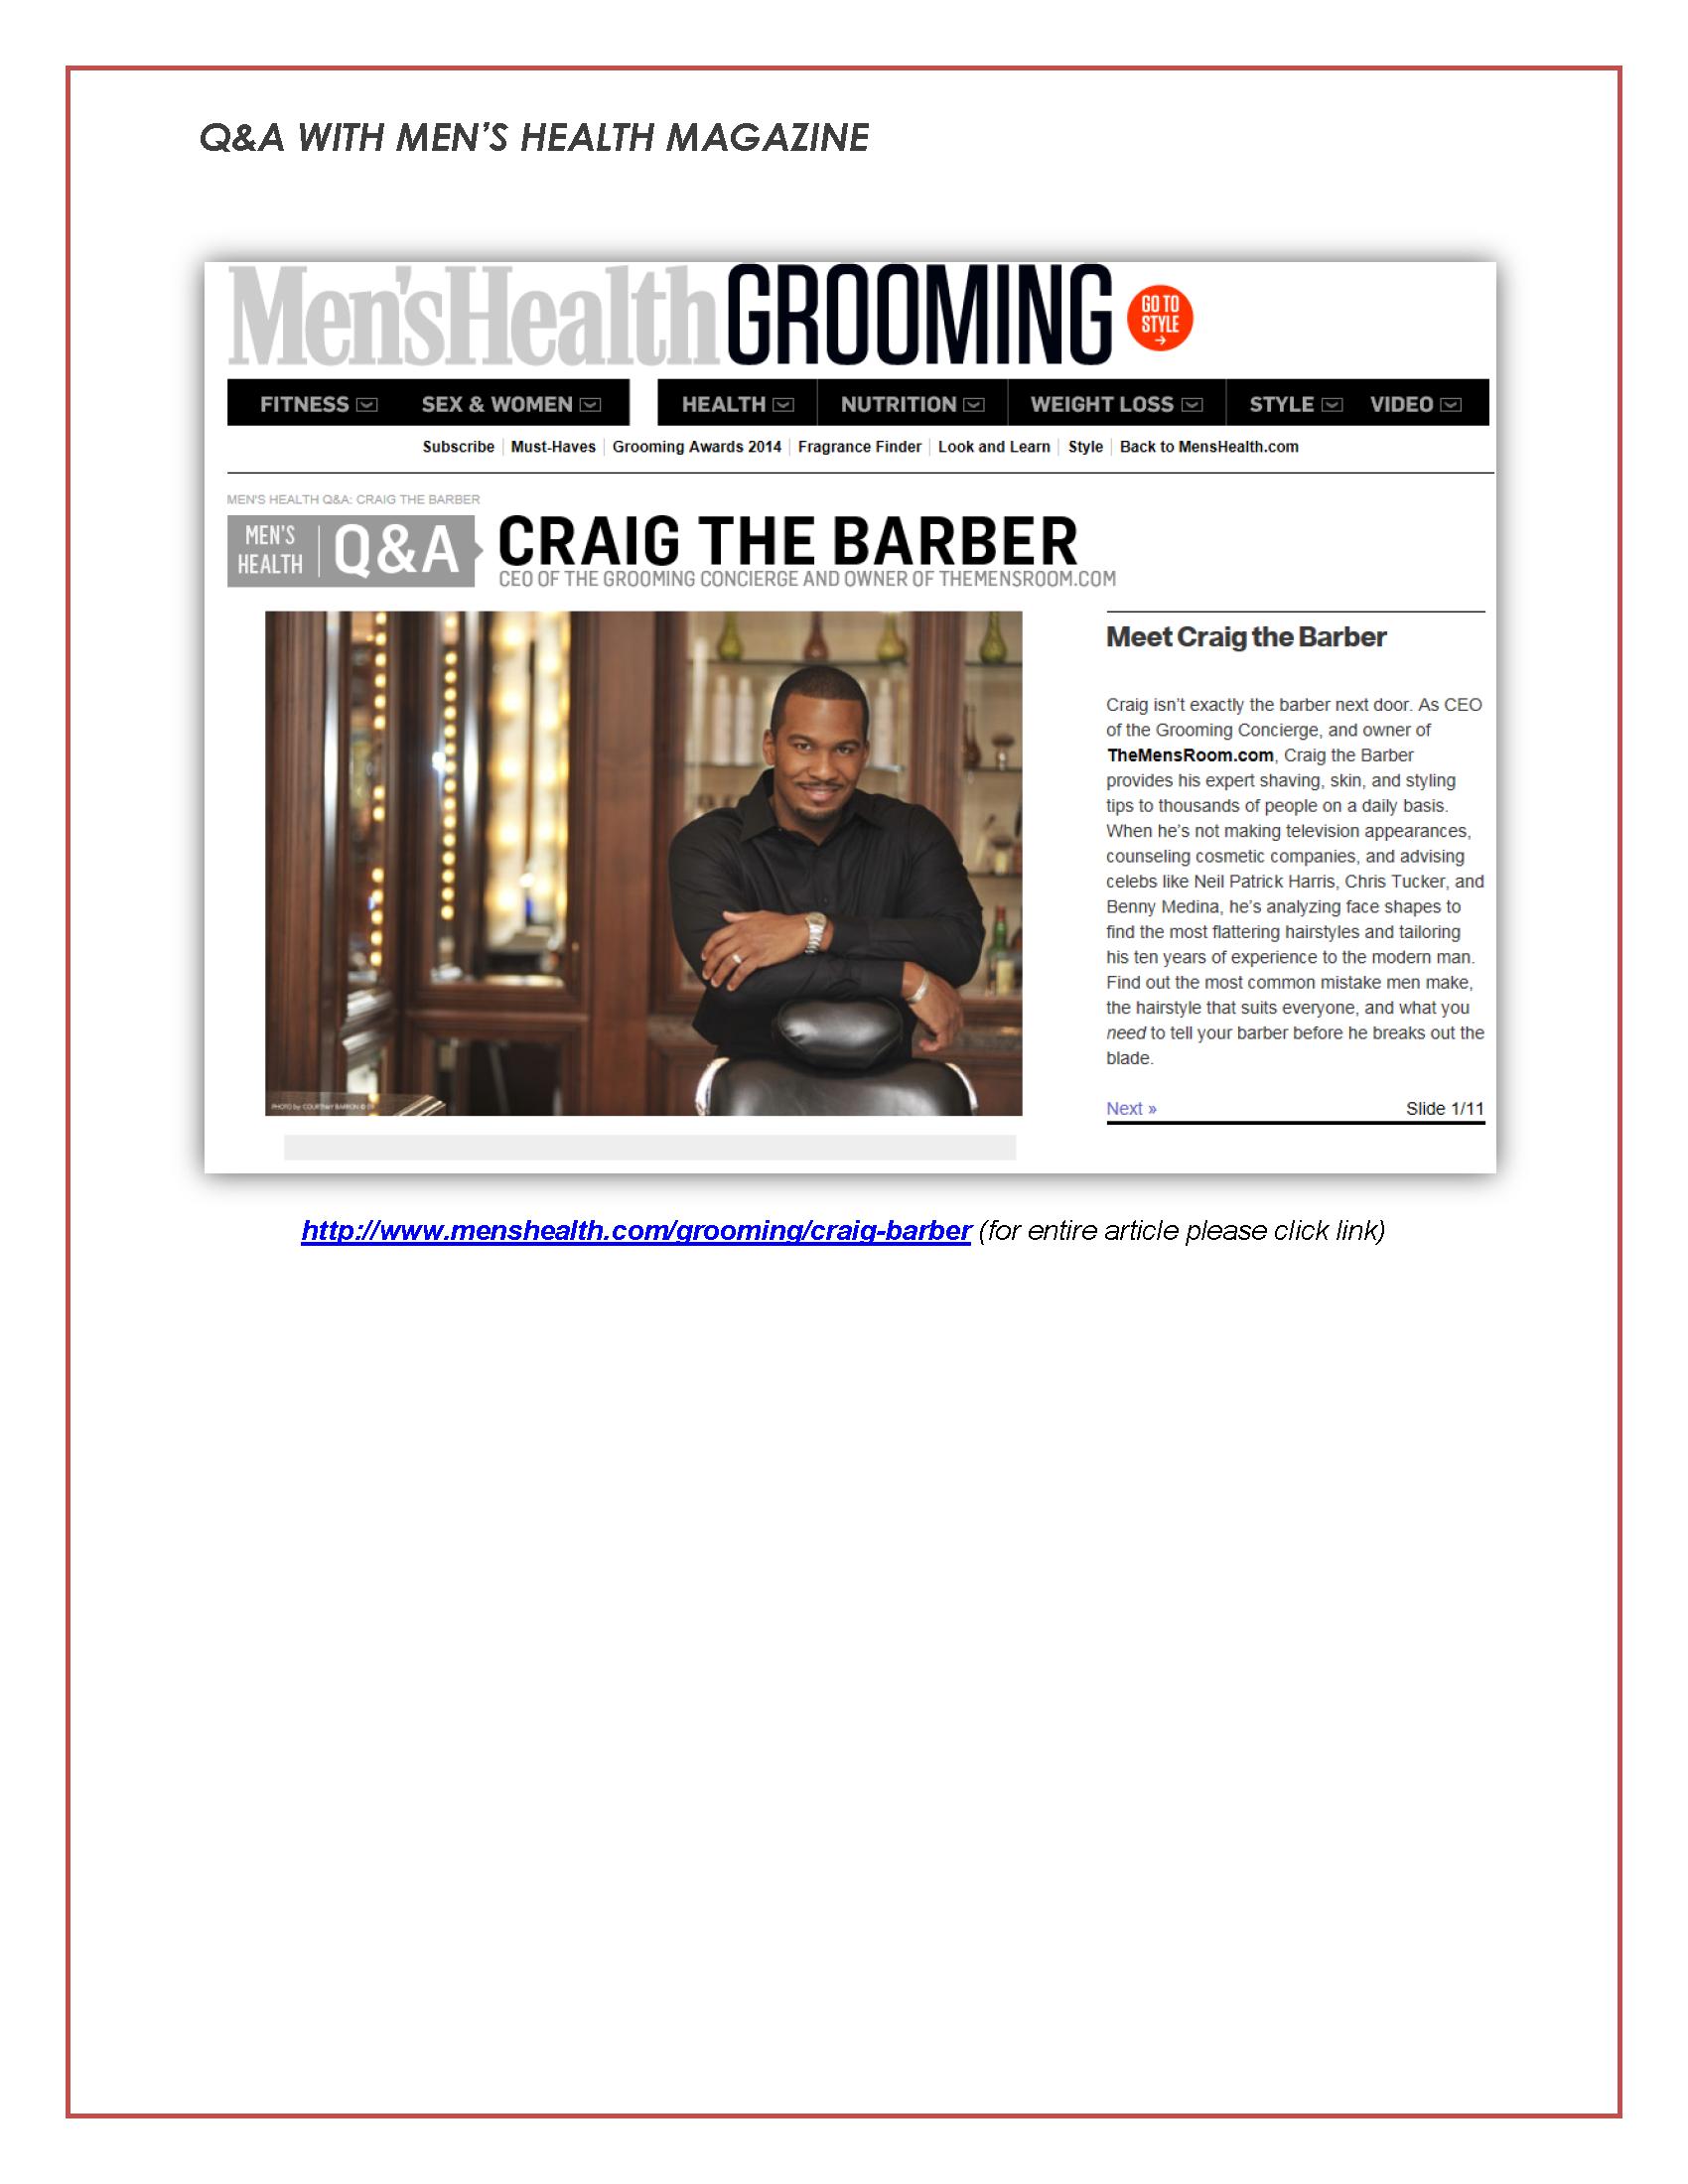 Craig the Barber Media Kit iMAGE3_Page_6